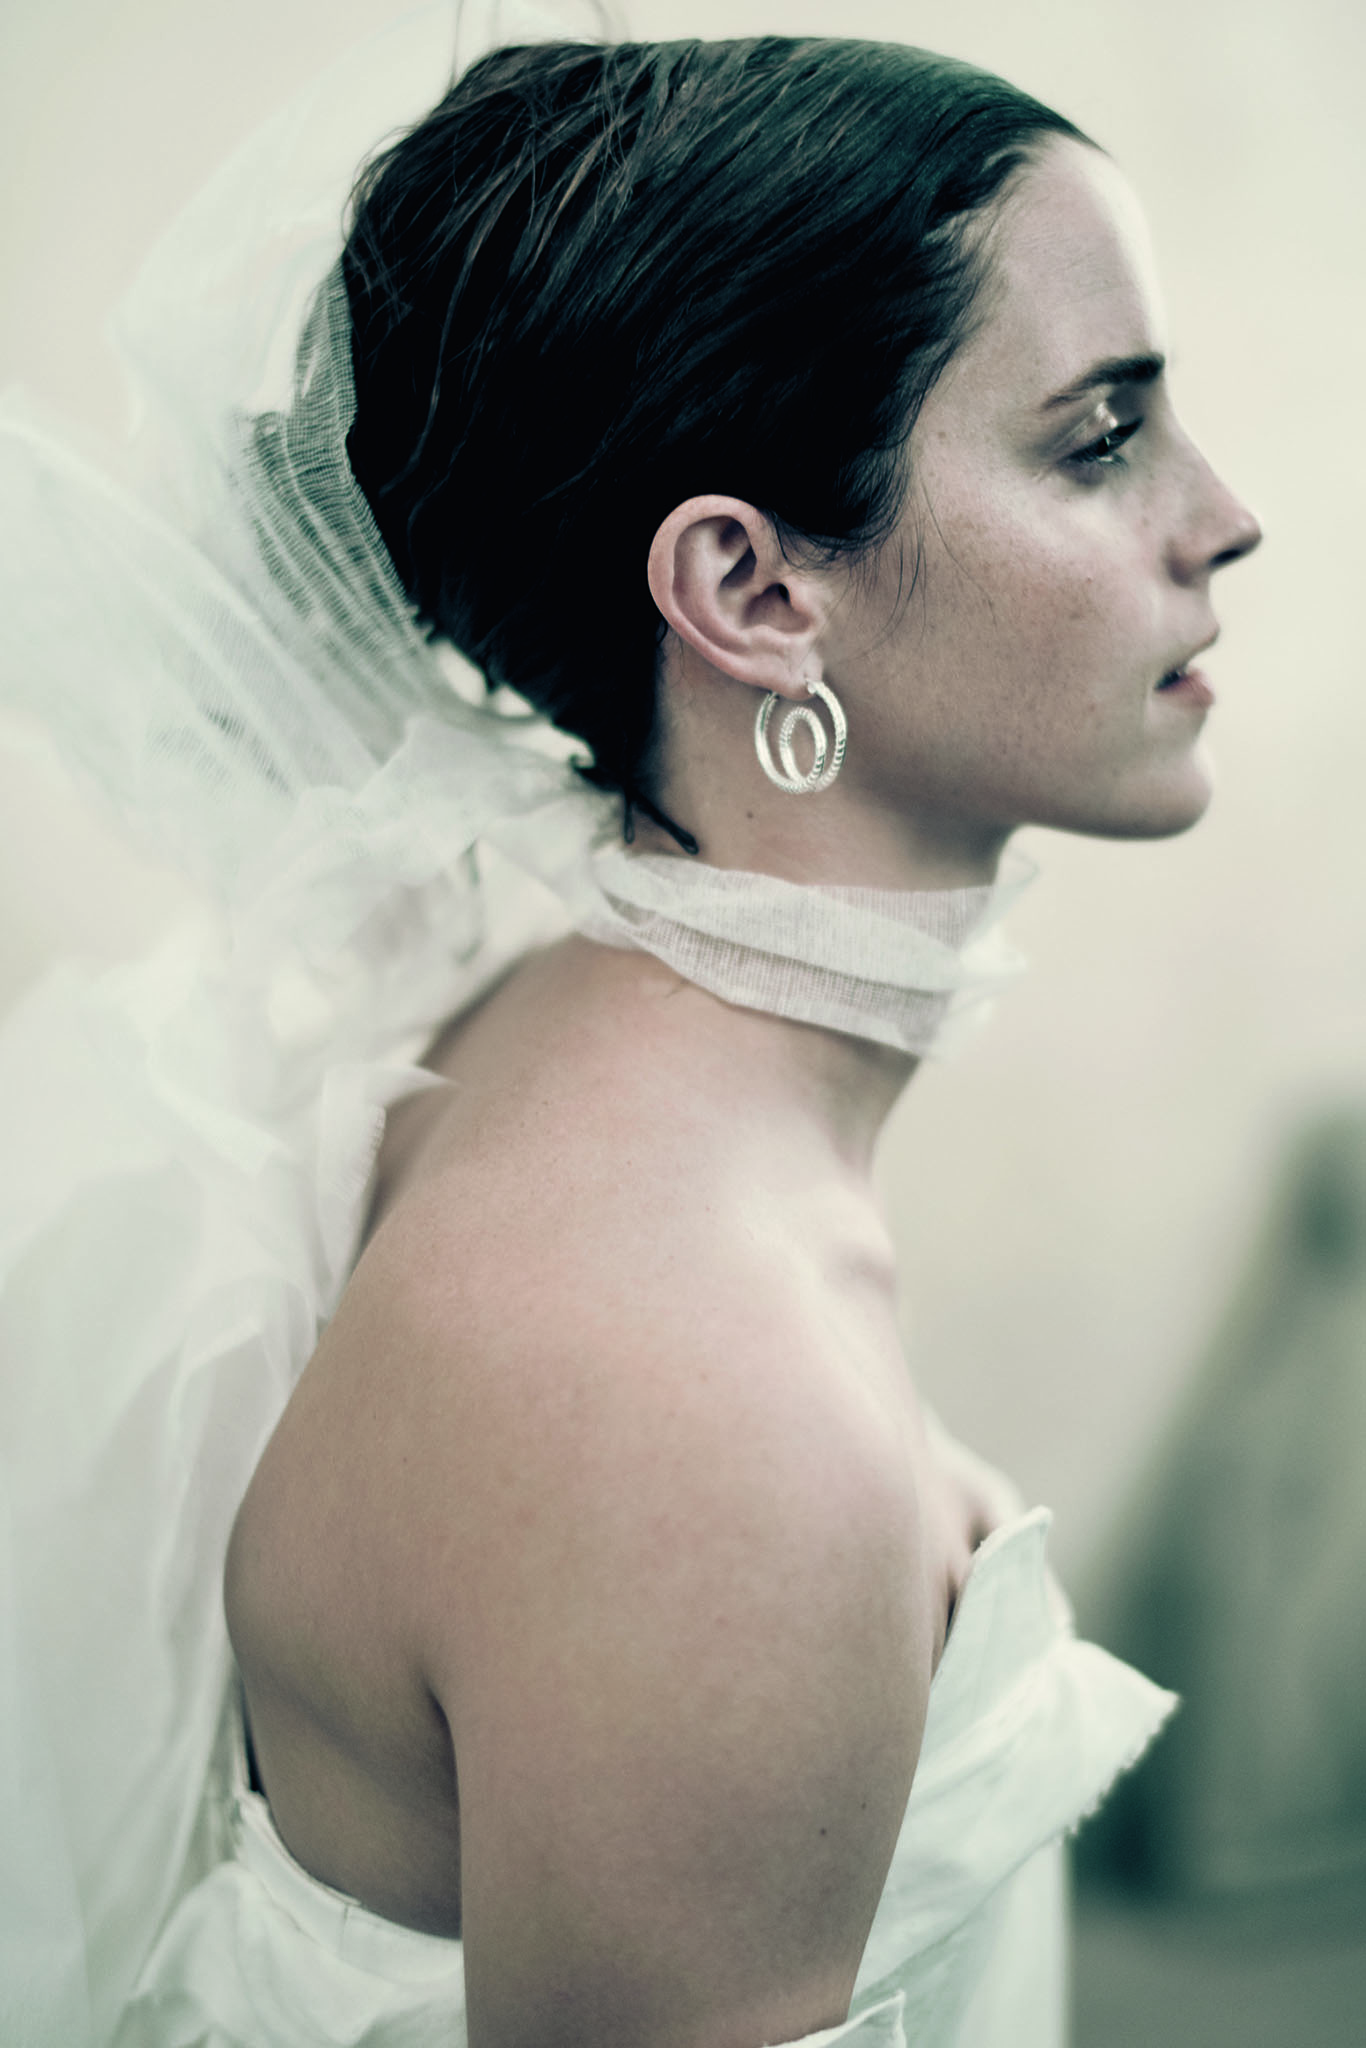 Emma Watson in the Pirelli 2020 calendar, shot by Paolo Roversi.